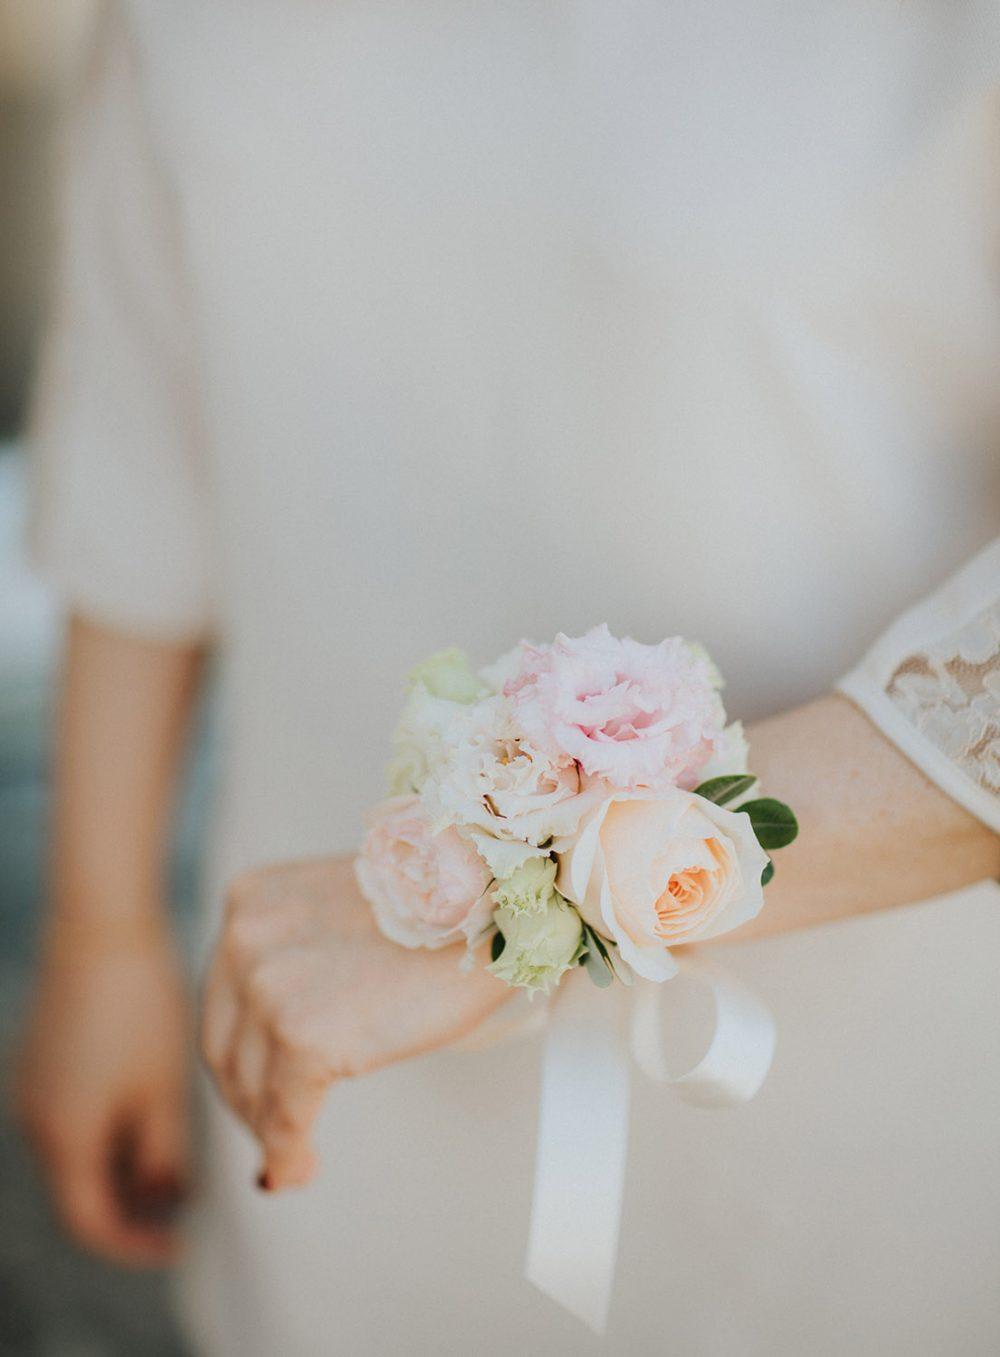 Bridesmaids Tml Tabea Maria Lisa Floristik Dekoration Fur